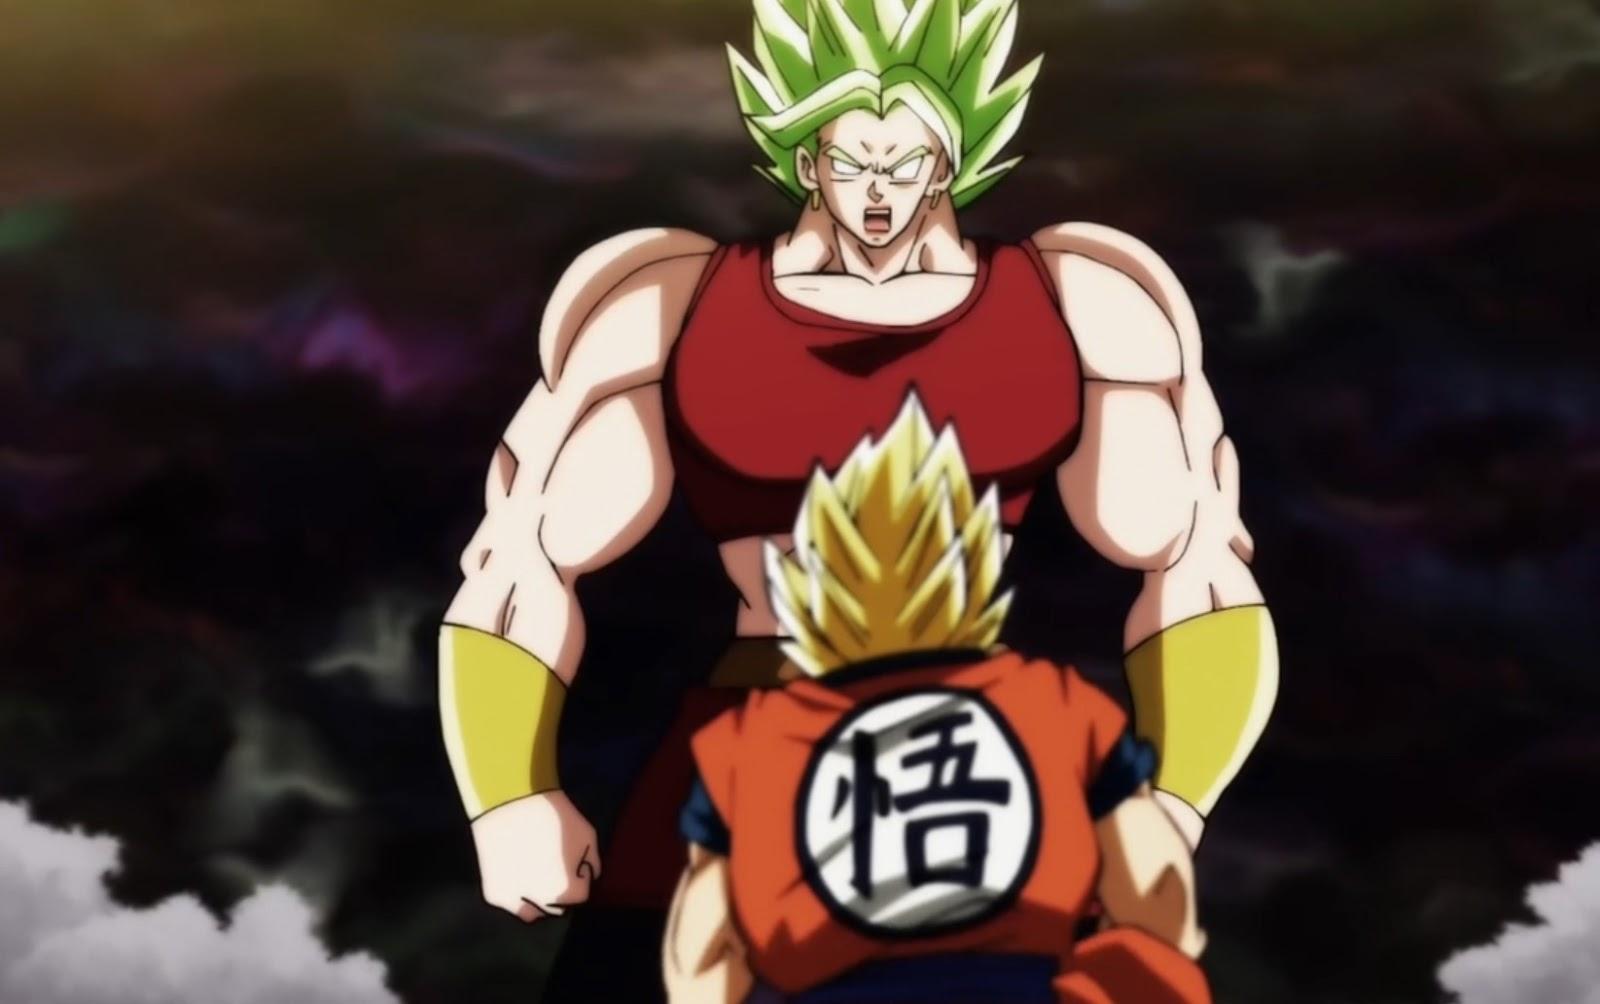 Dragon Ball Super: Episódio 100 – Fora de controle! Uma guerreira enlouquecida desperta!